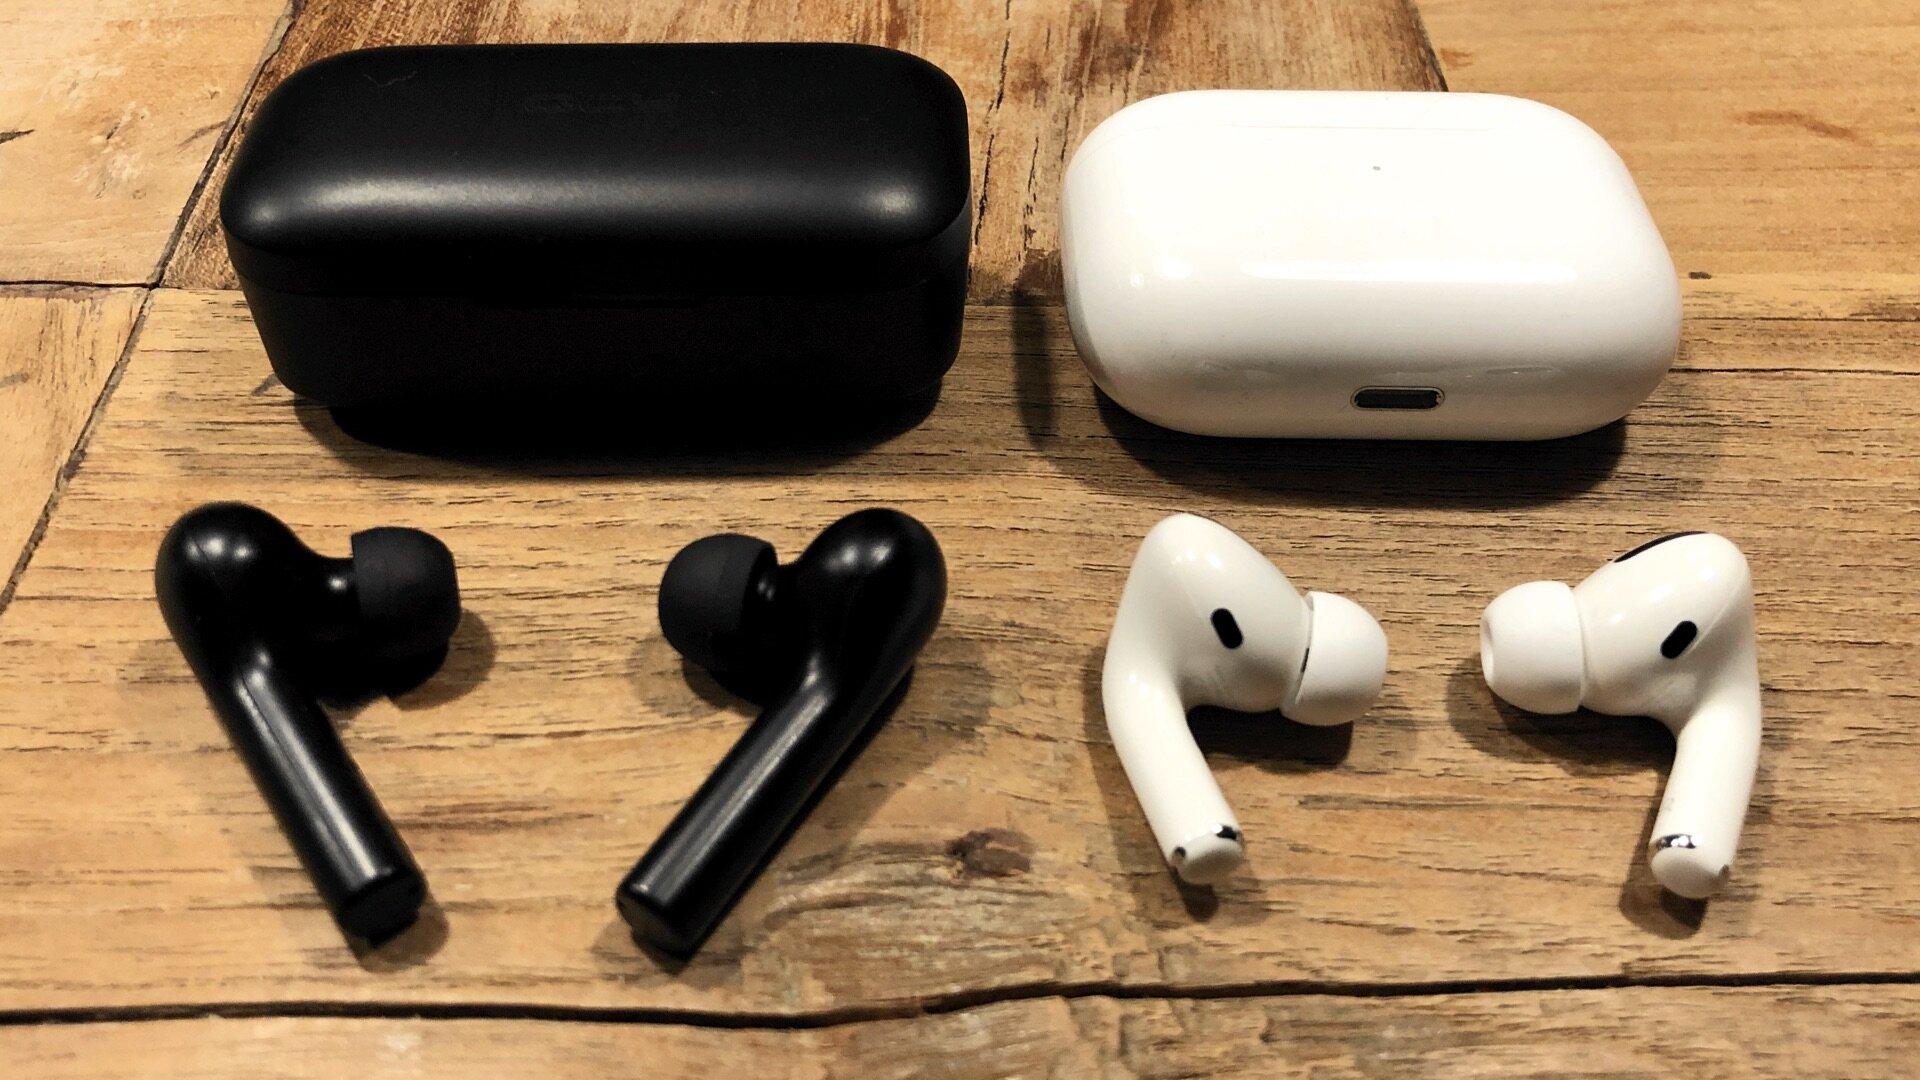 Mega Test Apple Airpods Pro Vs Cheap Wireless Earphones